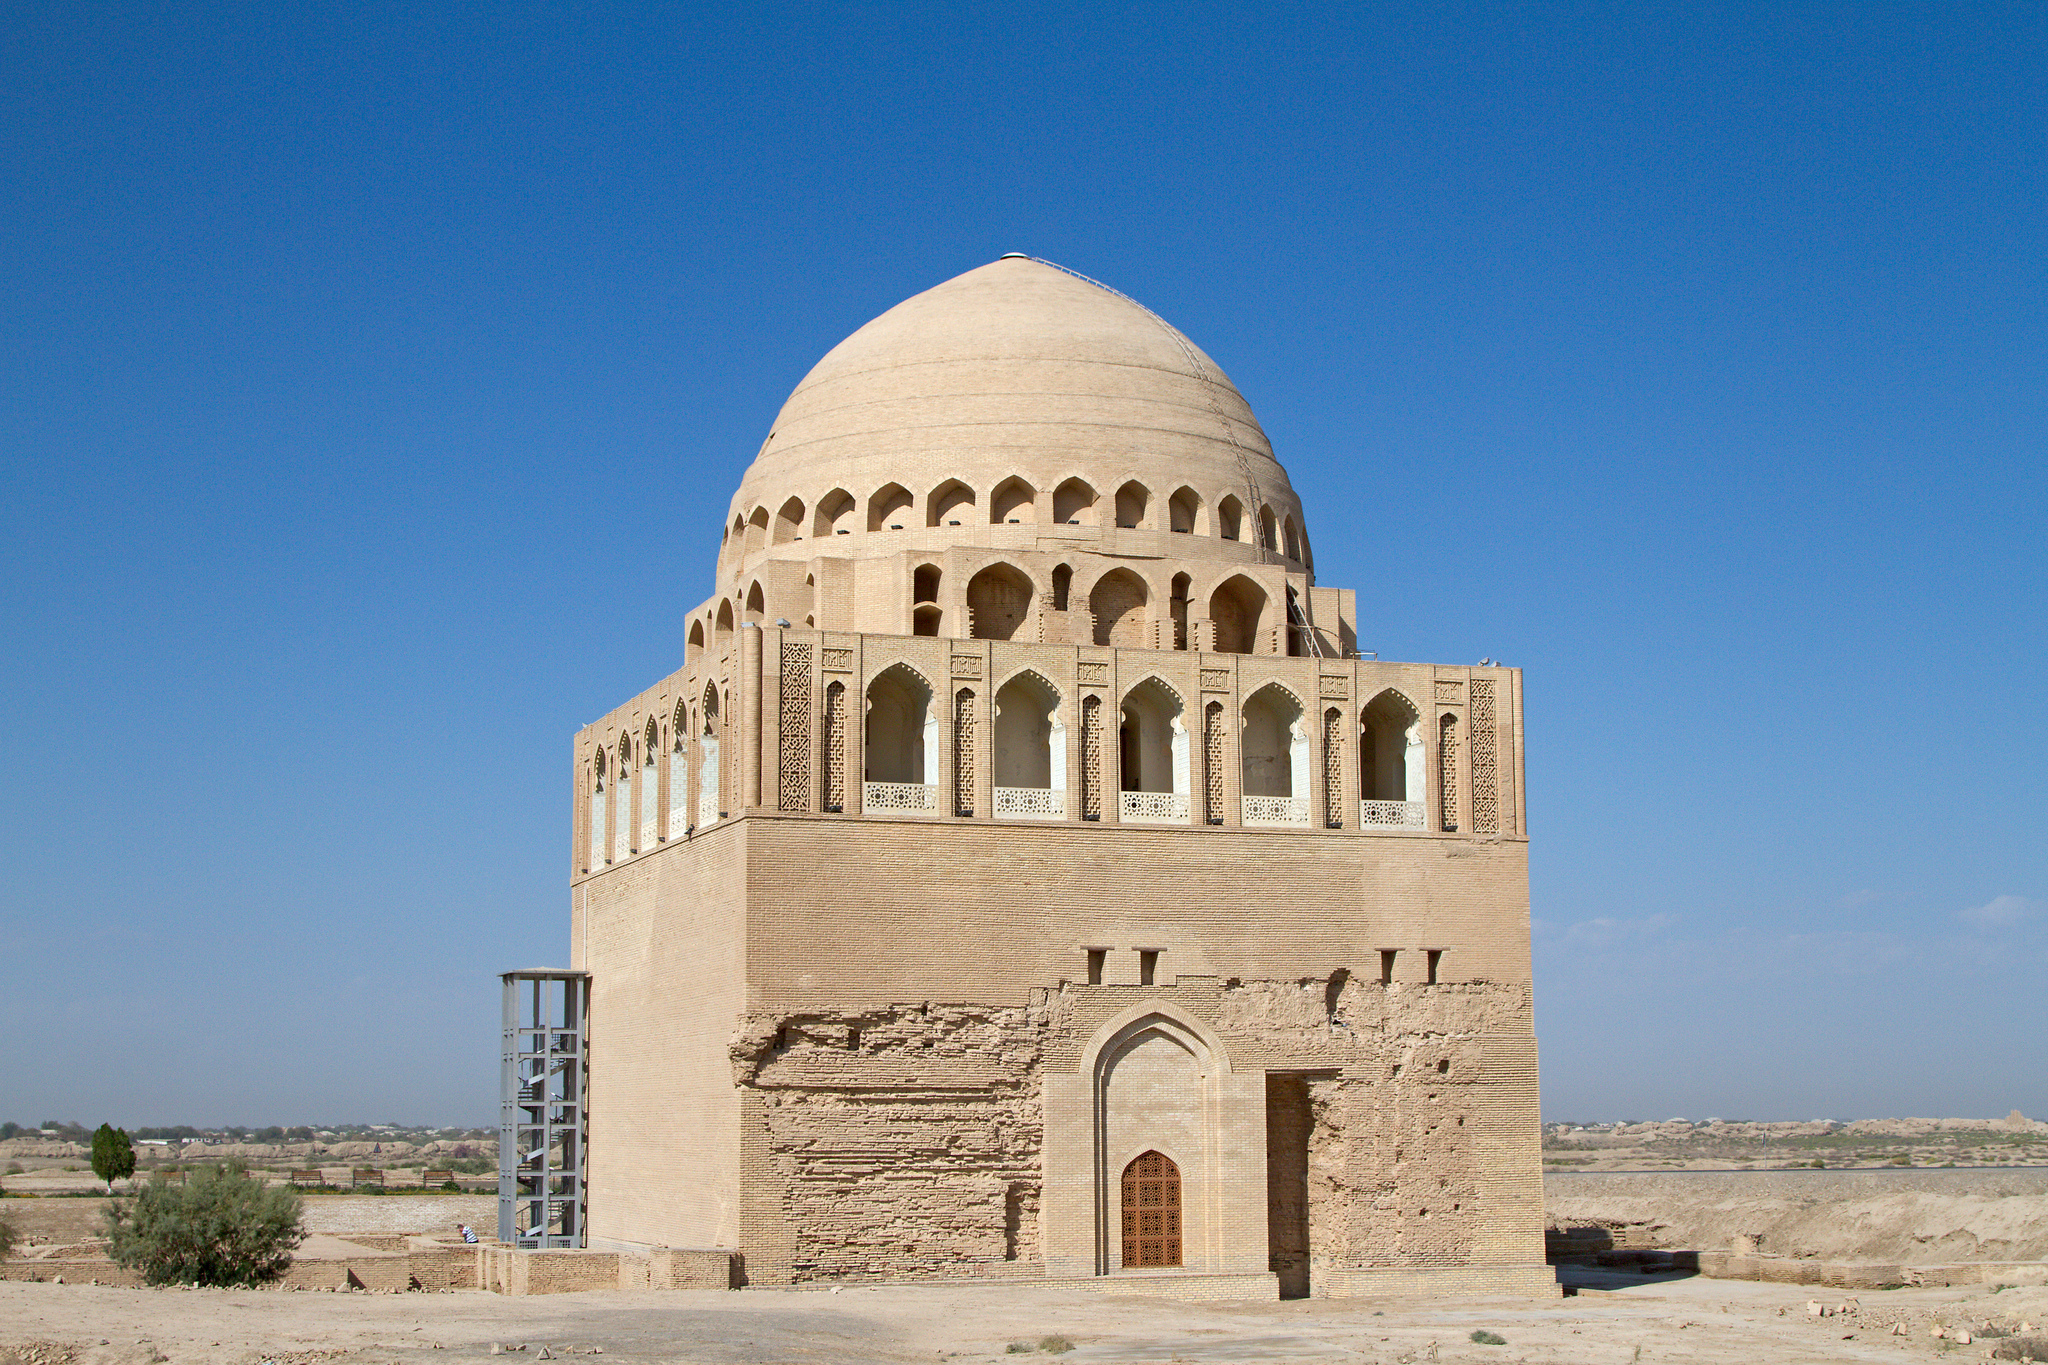 Sultan Eagle Silk Mausoleum in Merv